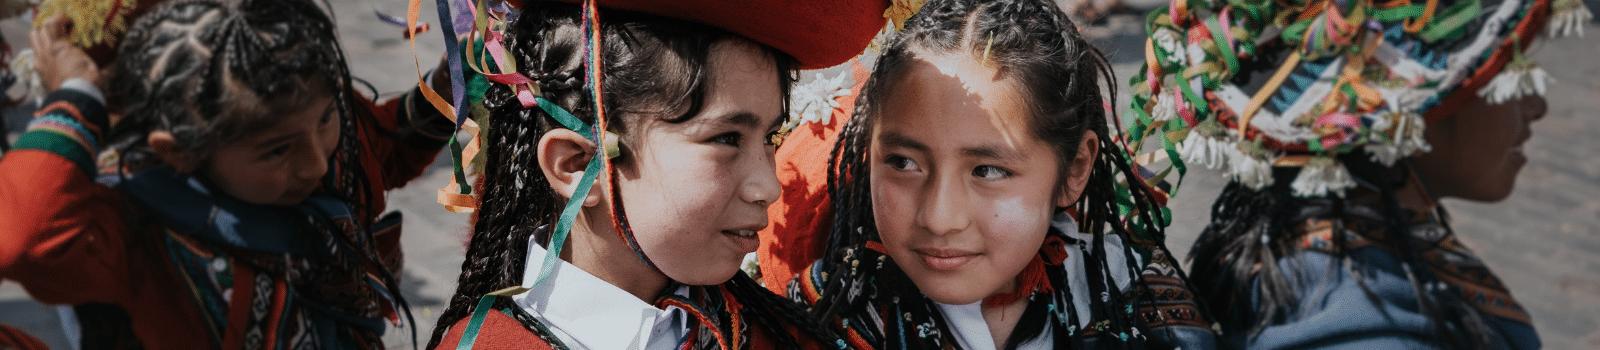 Children in traditional Peruvian dress